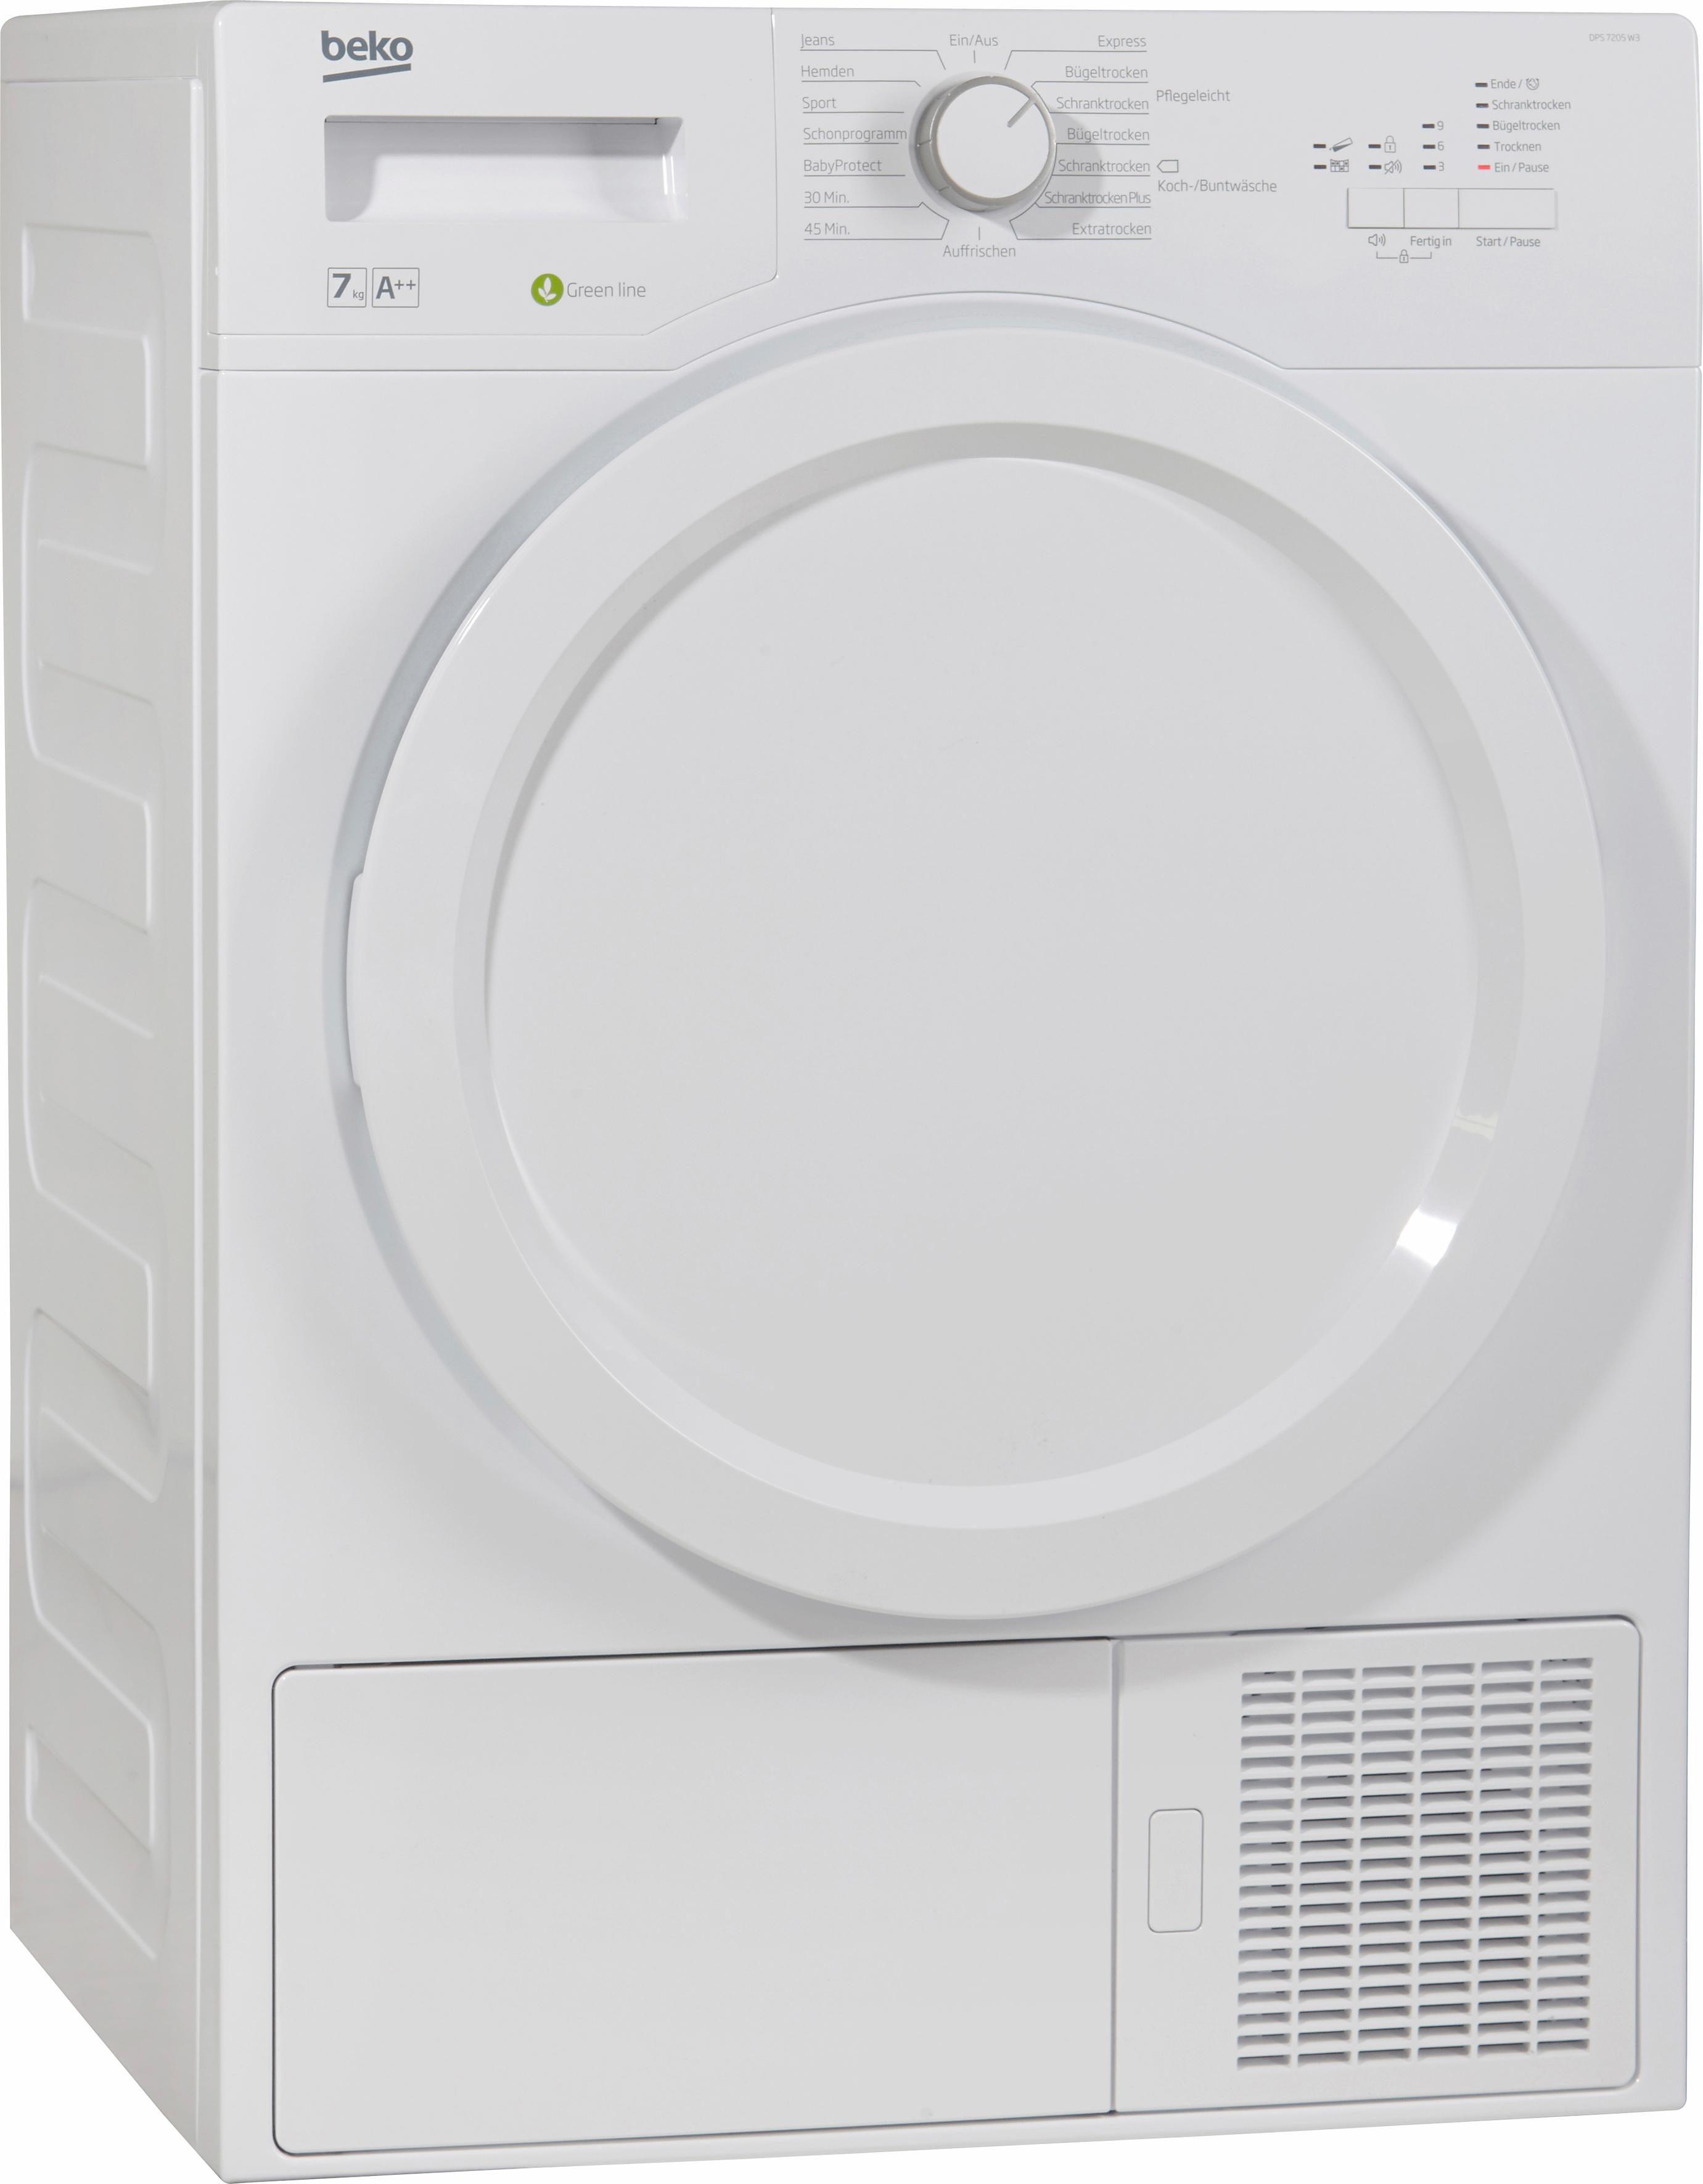 BEKO Trockner DPS 7205 W3, A++, 7 kg